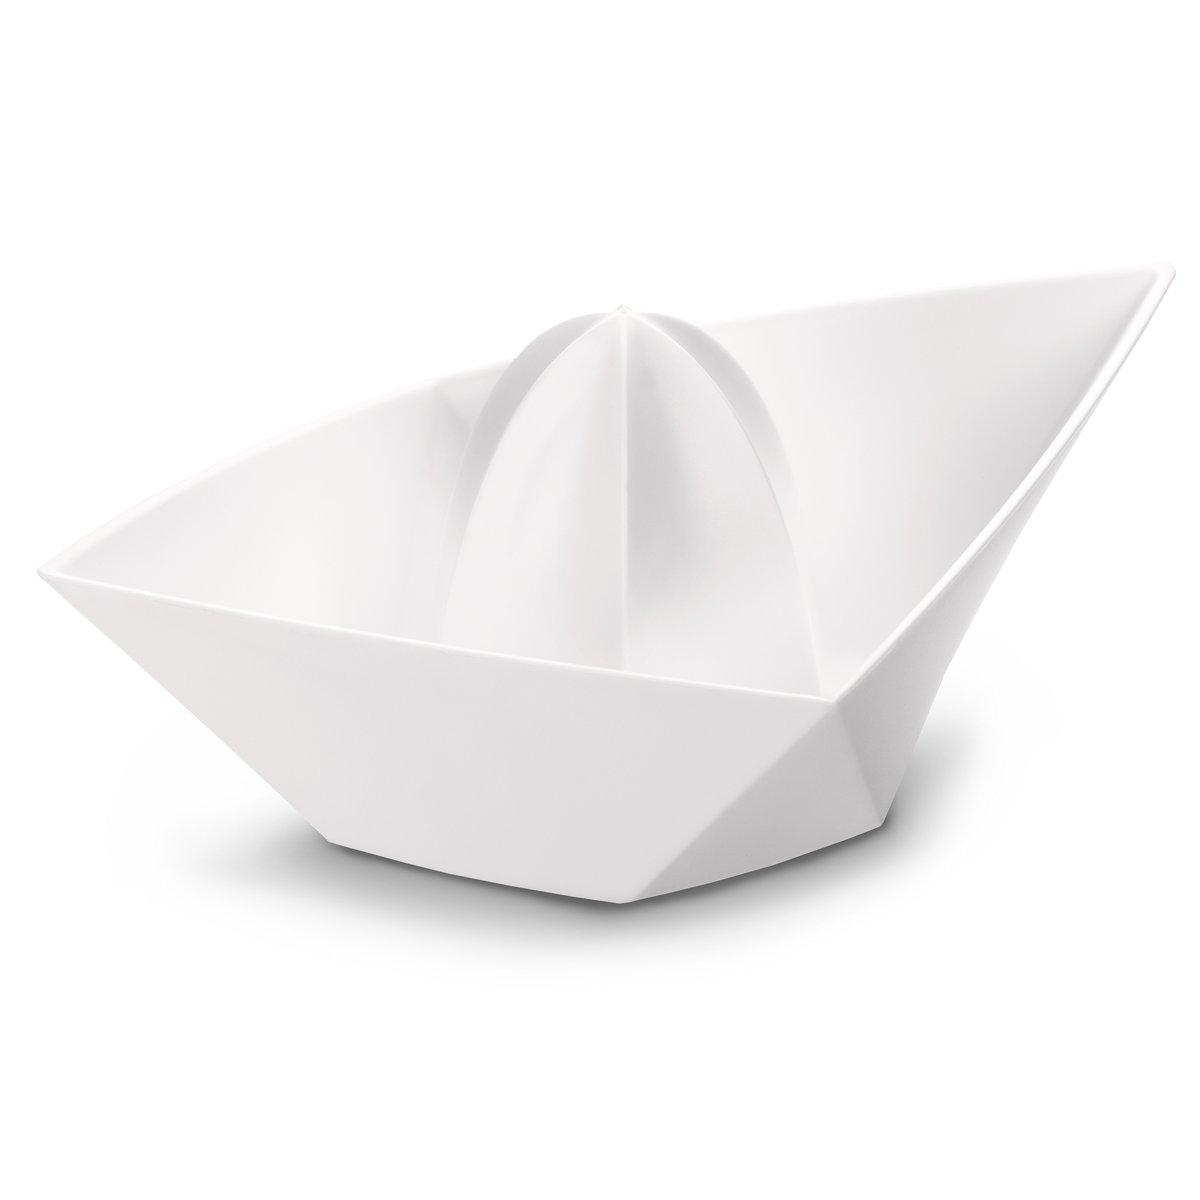 Koziol Ahoi XL Sinaasappelpers - Wit kopen